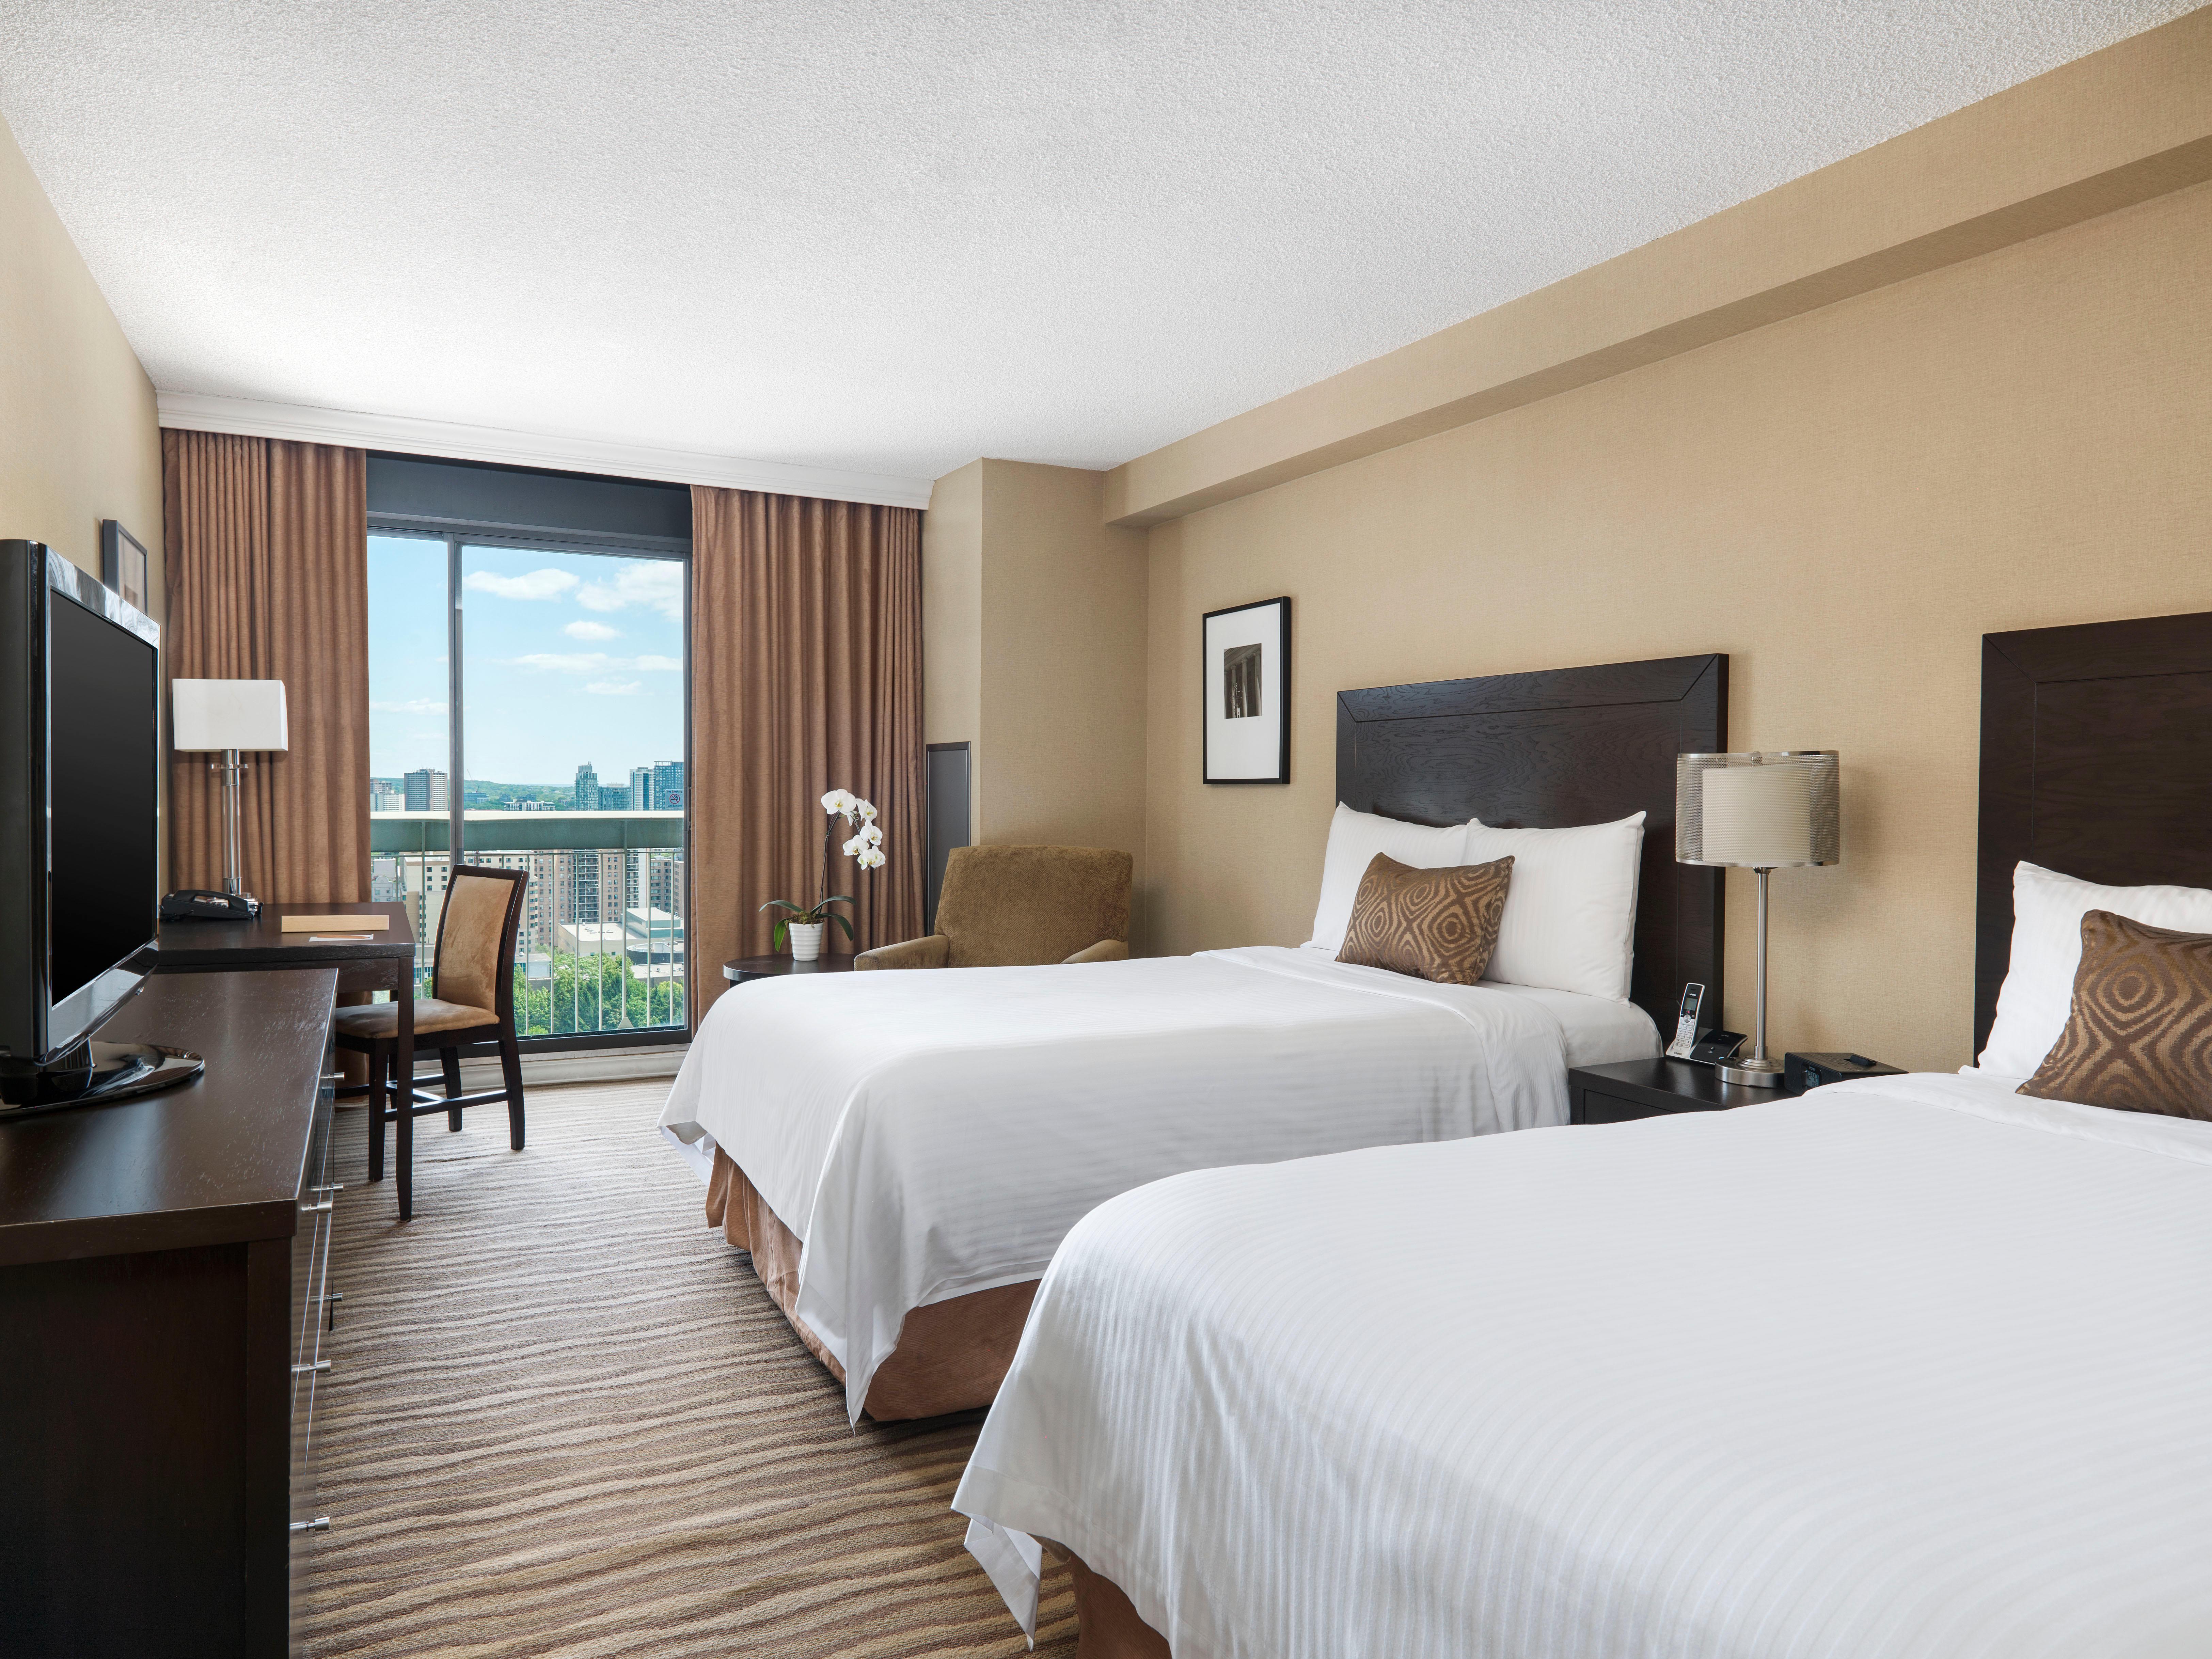 CHELSEA HOTEL, TORONTO in Toronto: Deluxe Double Room